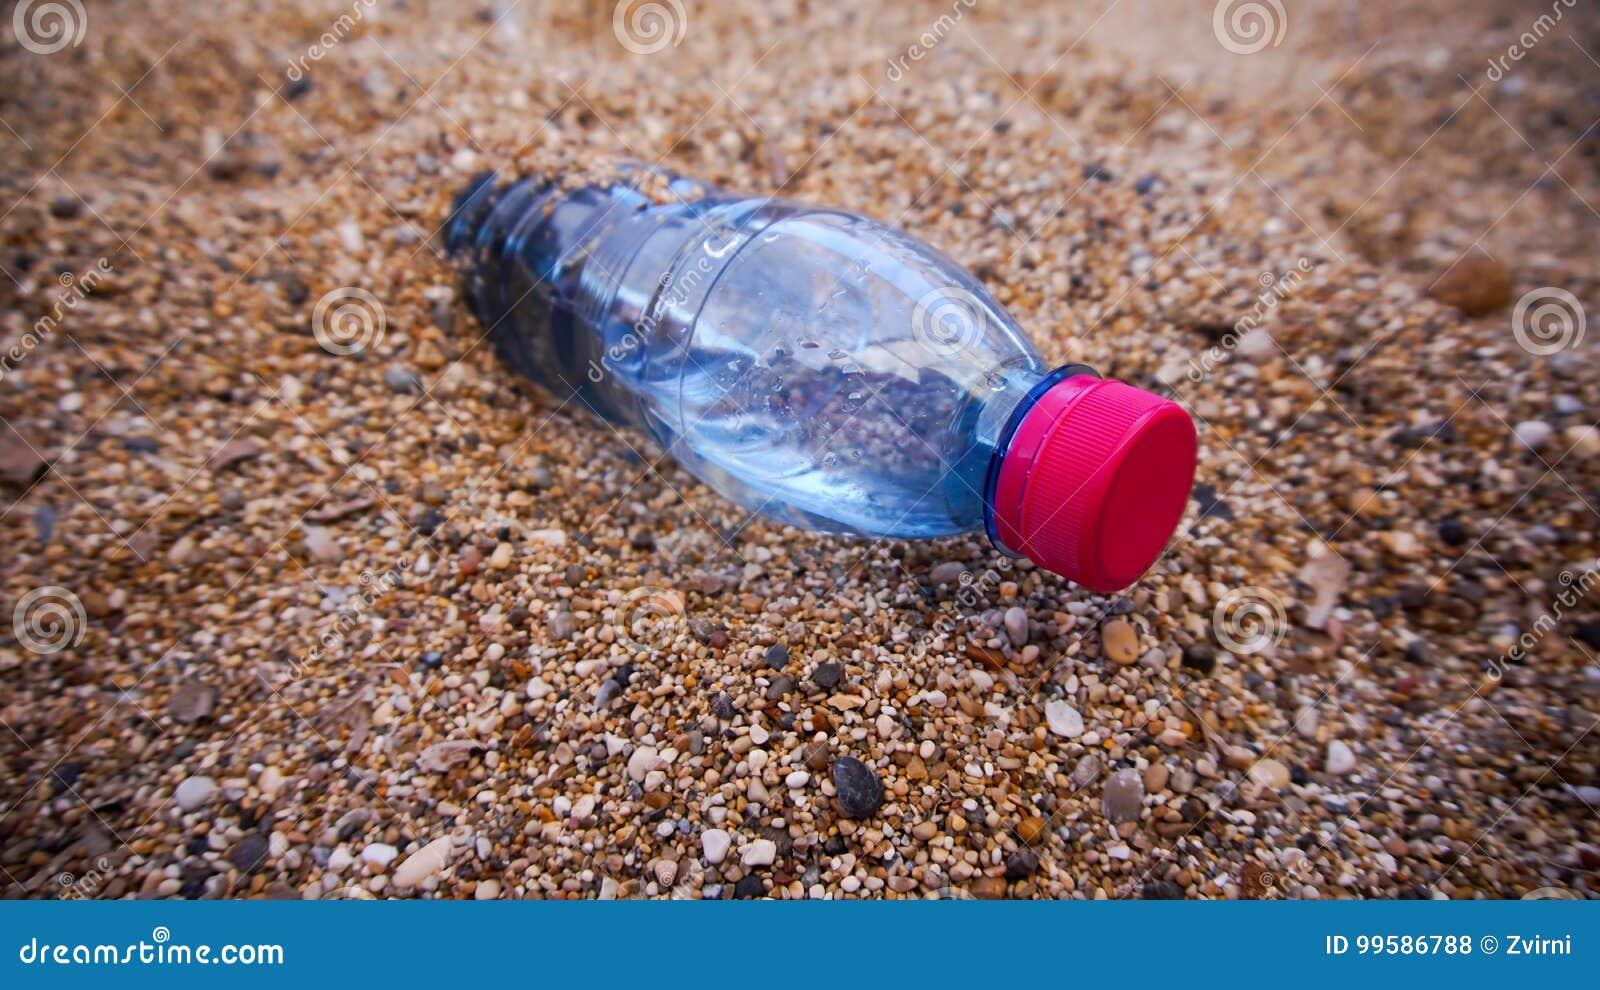 Plastic bottle in the sand